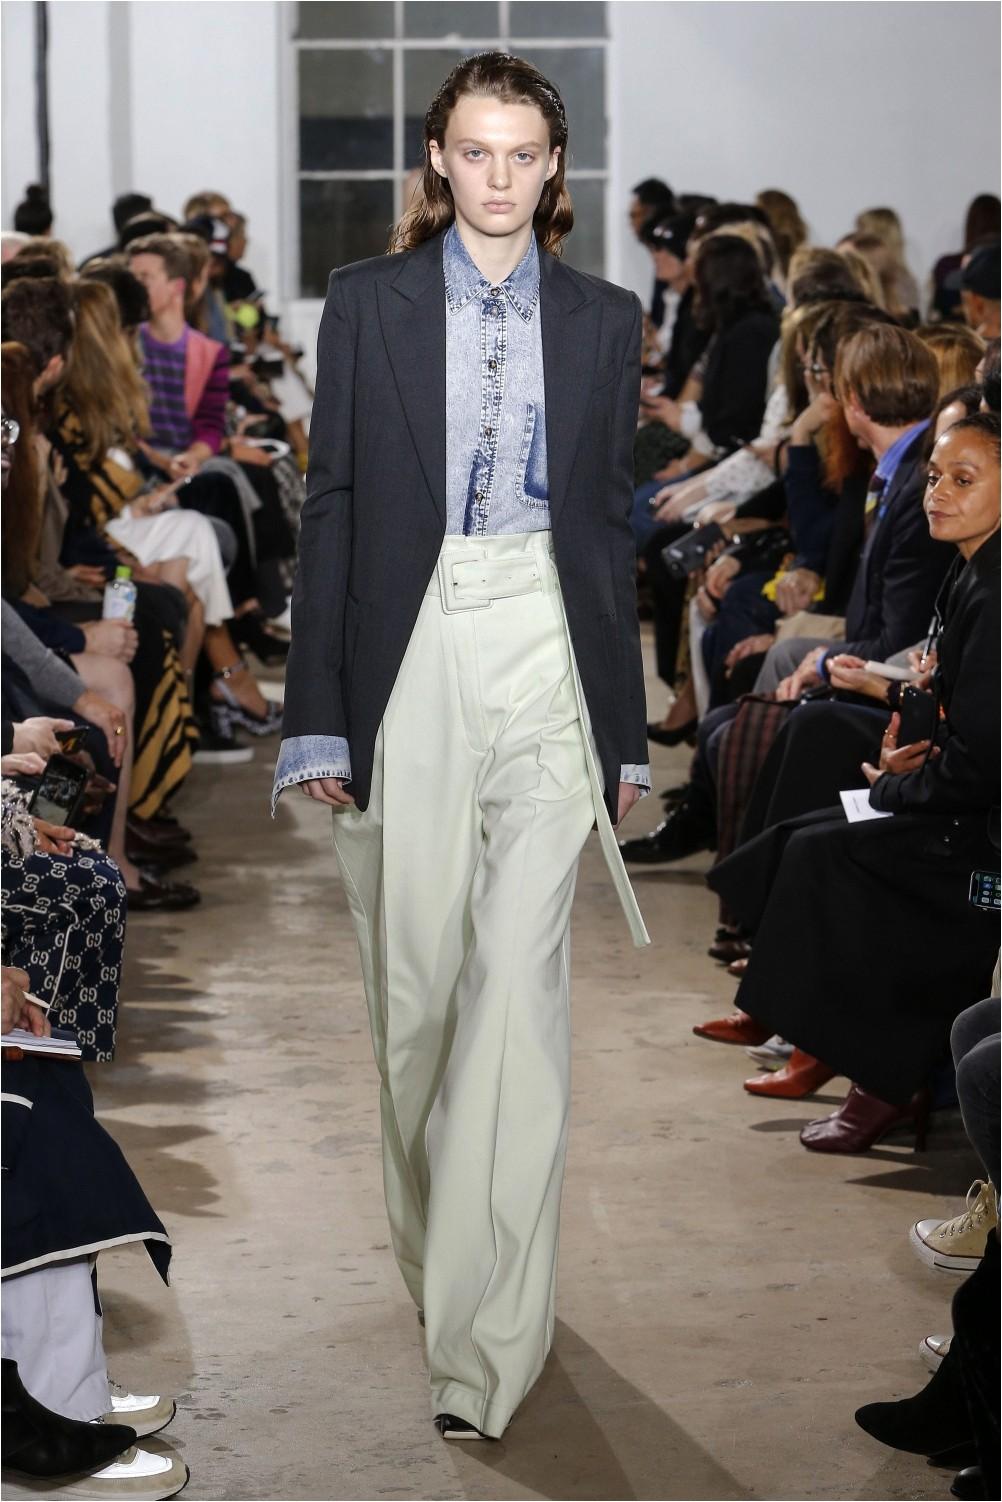 Wide retro pants by Proenza Schouler